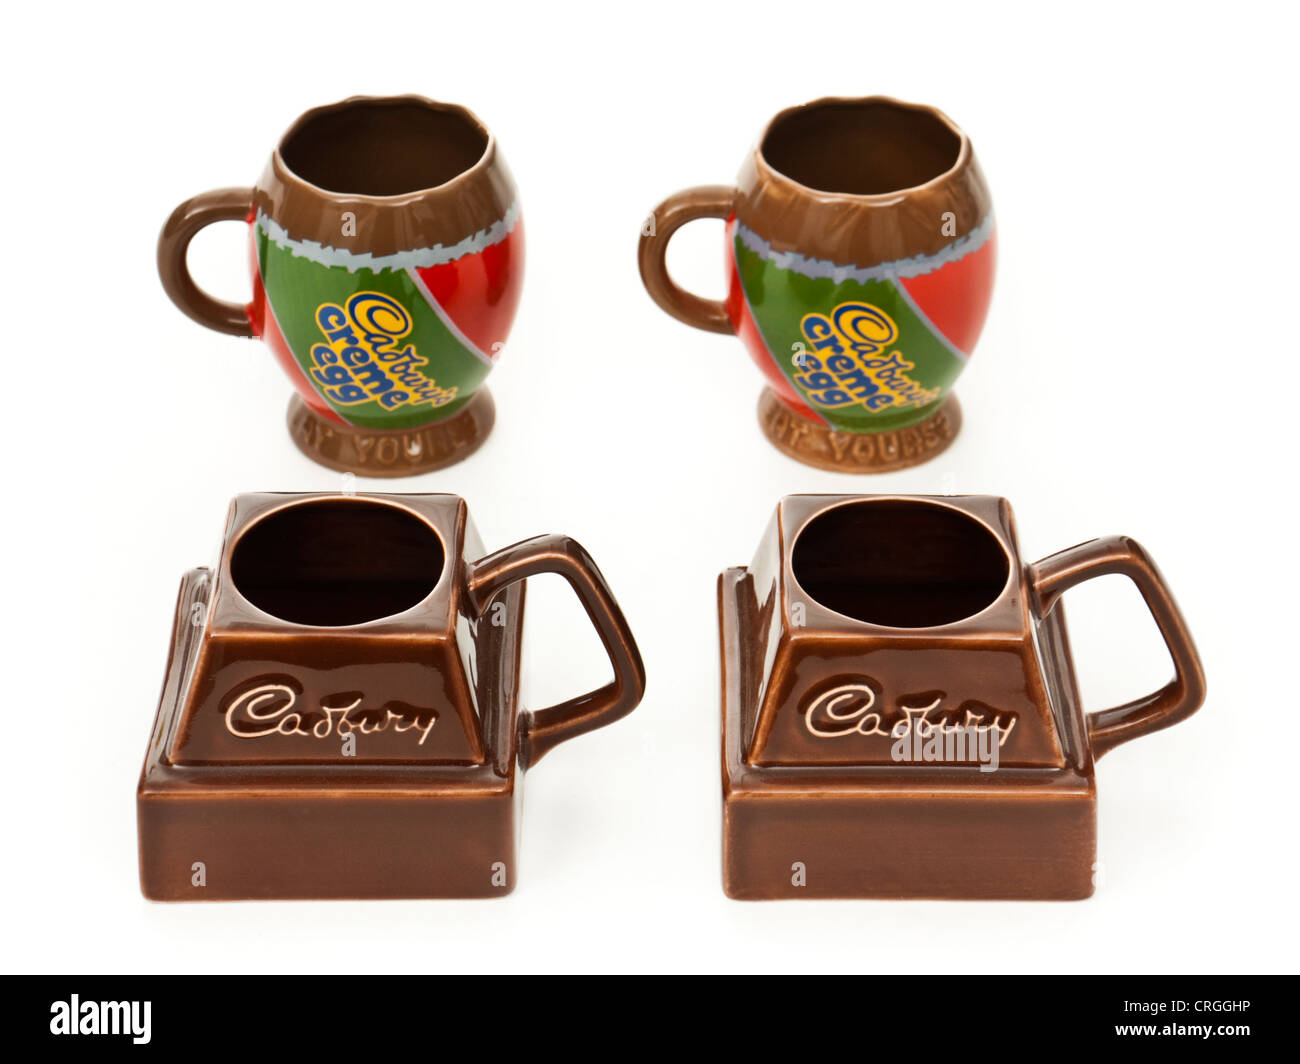 Selection of Cadbury promotional mugs by Carltonware Pottery - Stock Image